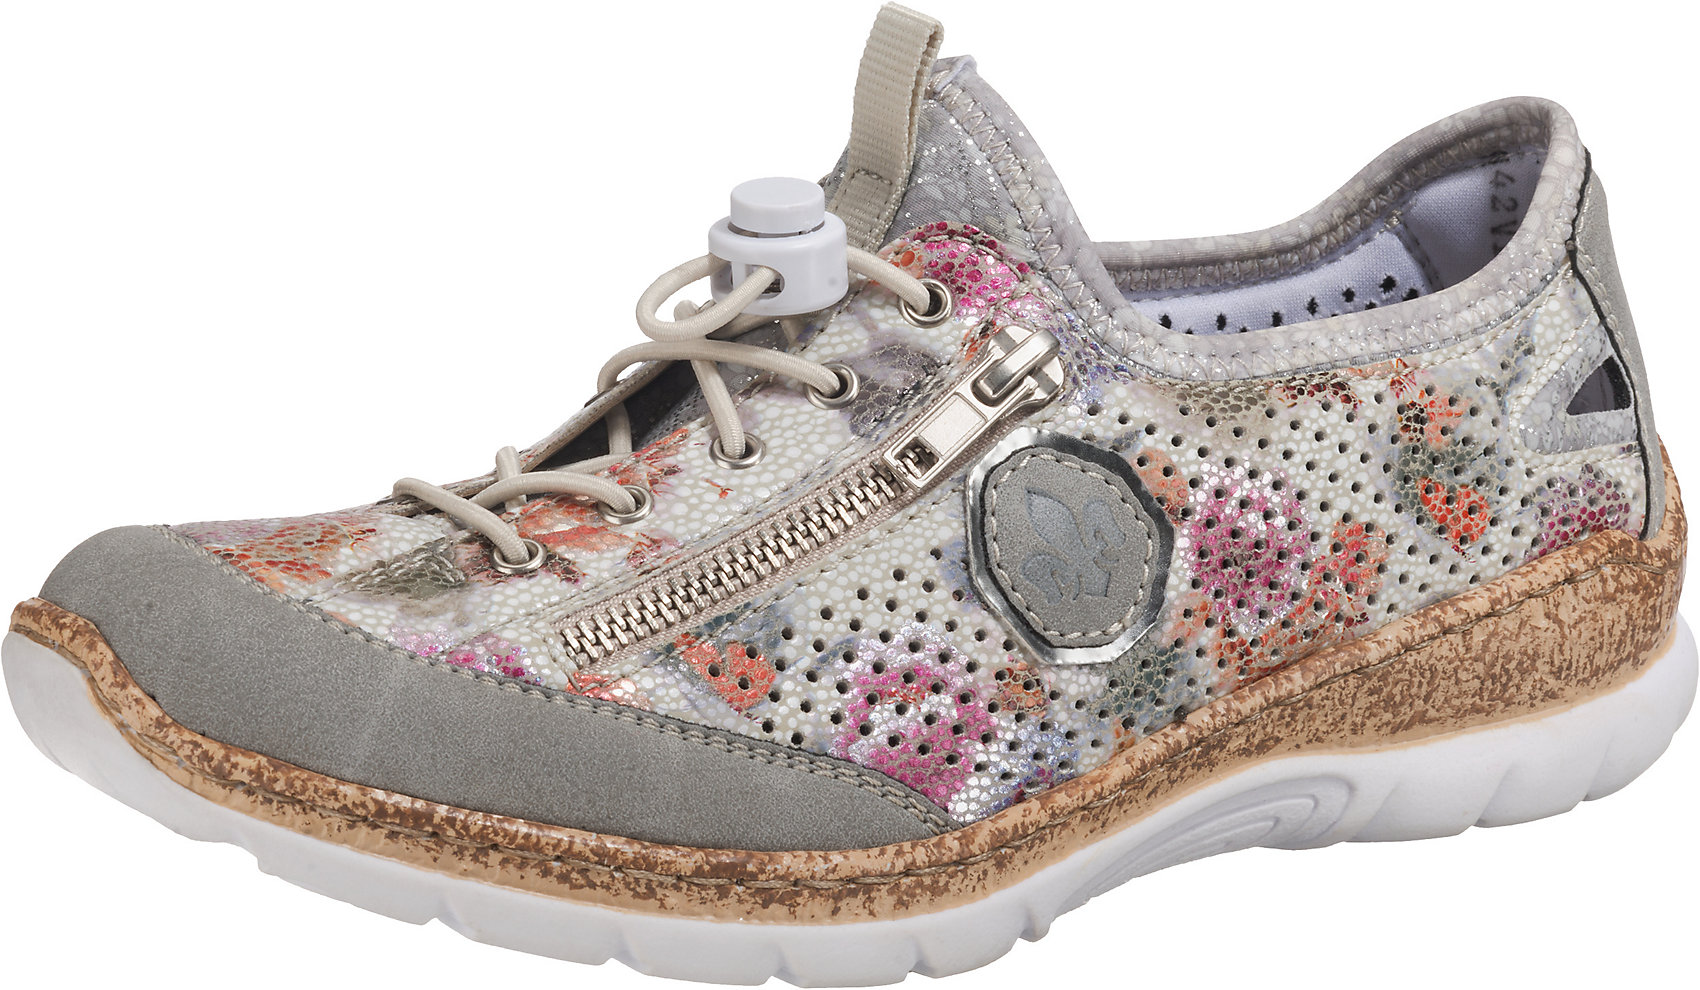 Neu Für Namibiamosaikmirrorscuba Zu Rieker Sneakers Damen Details 7568623 Low vnwN0m8